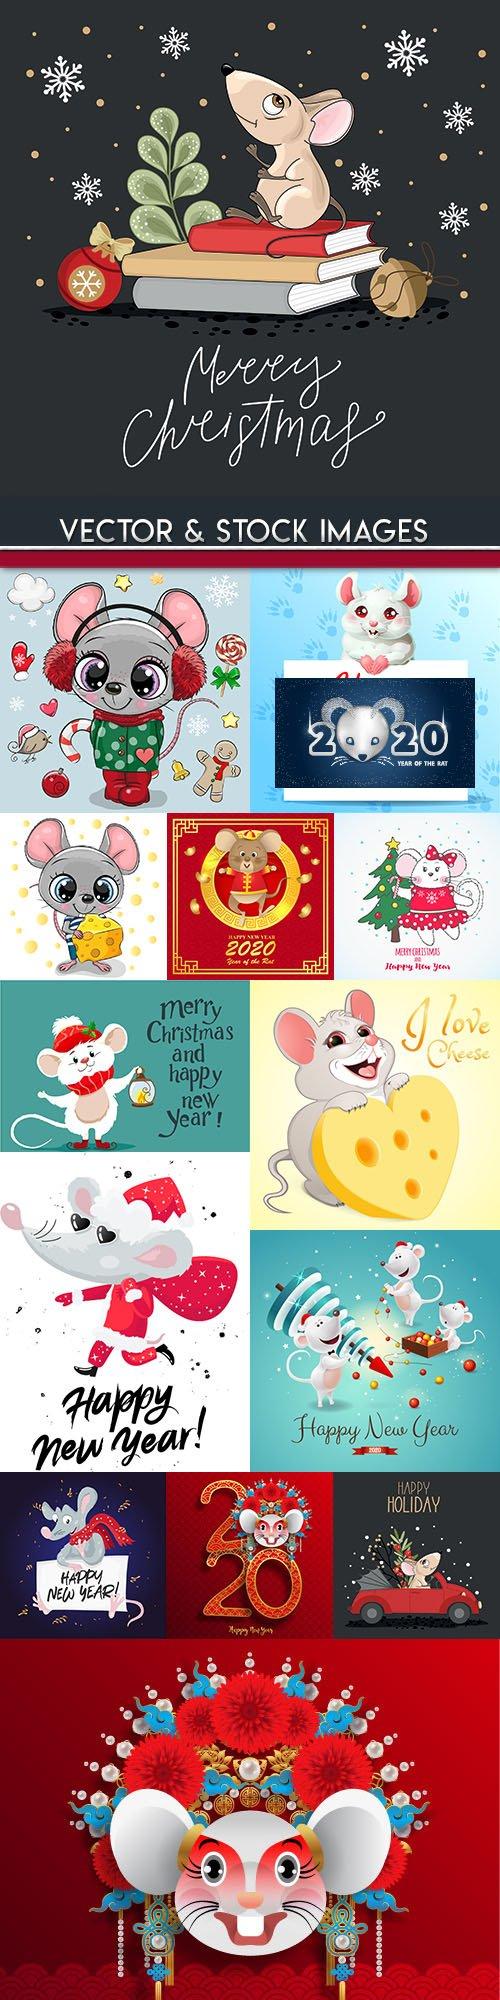 Rat cartoon symbol of New Year 2020 illustration 3